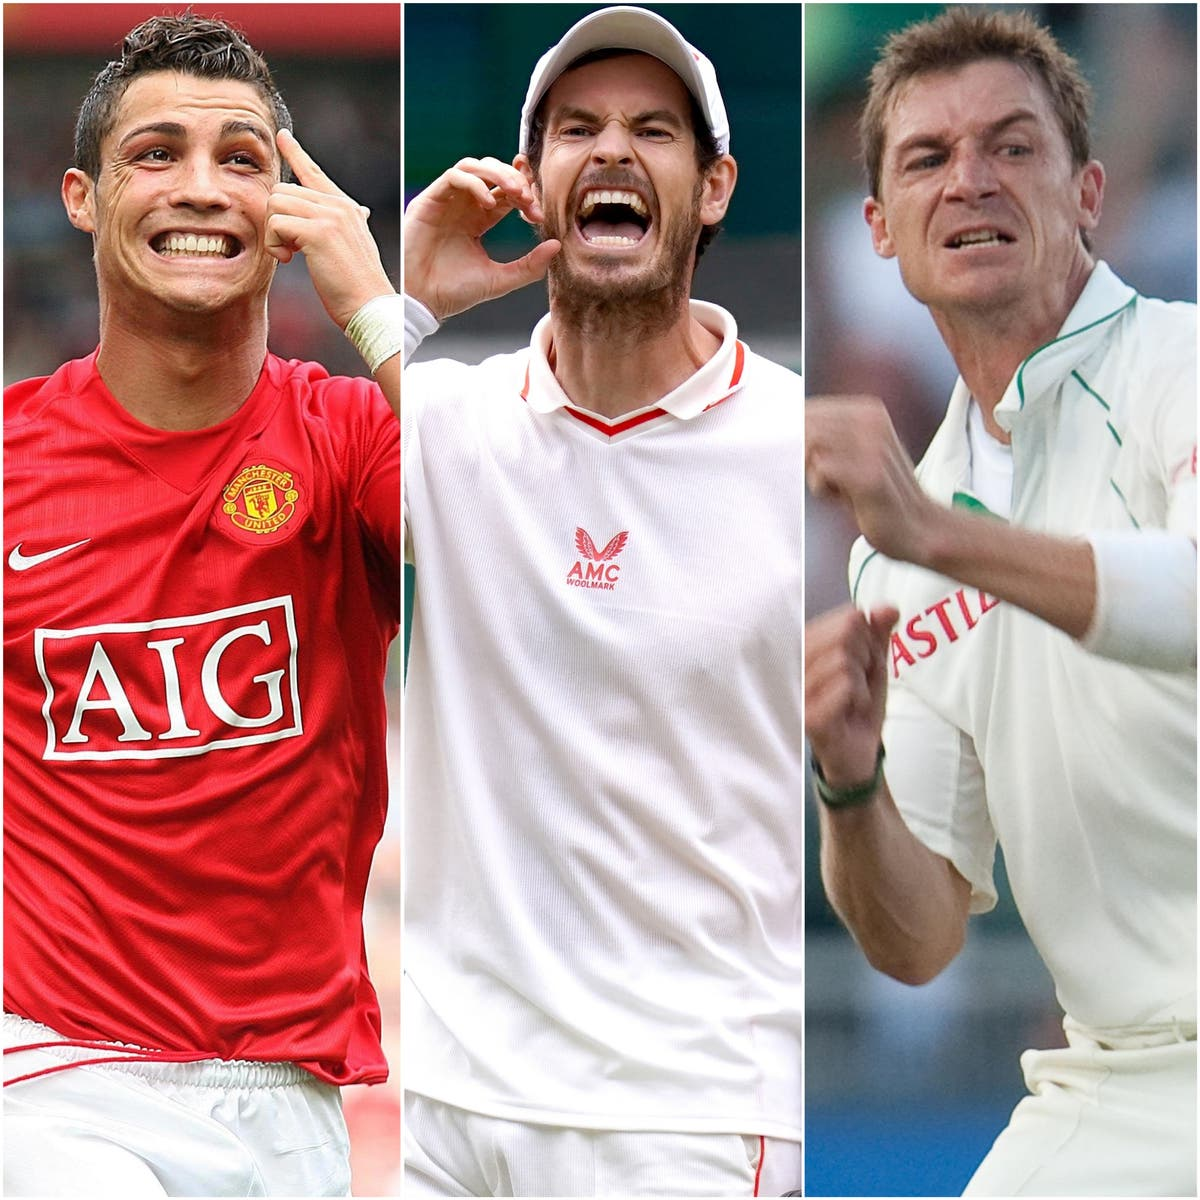 Ronaldo returns, Murray jokes and Steyn retires – Tuesday's sporting social